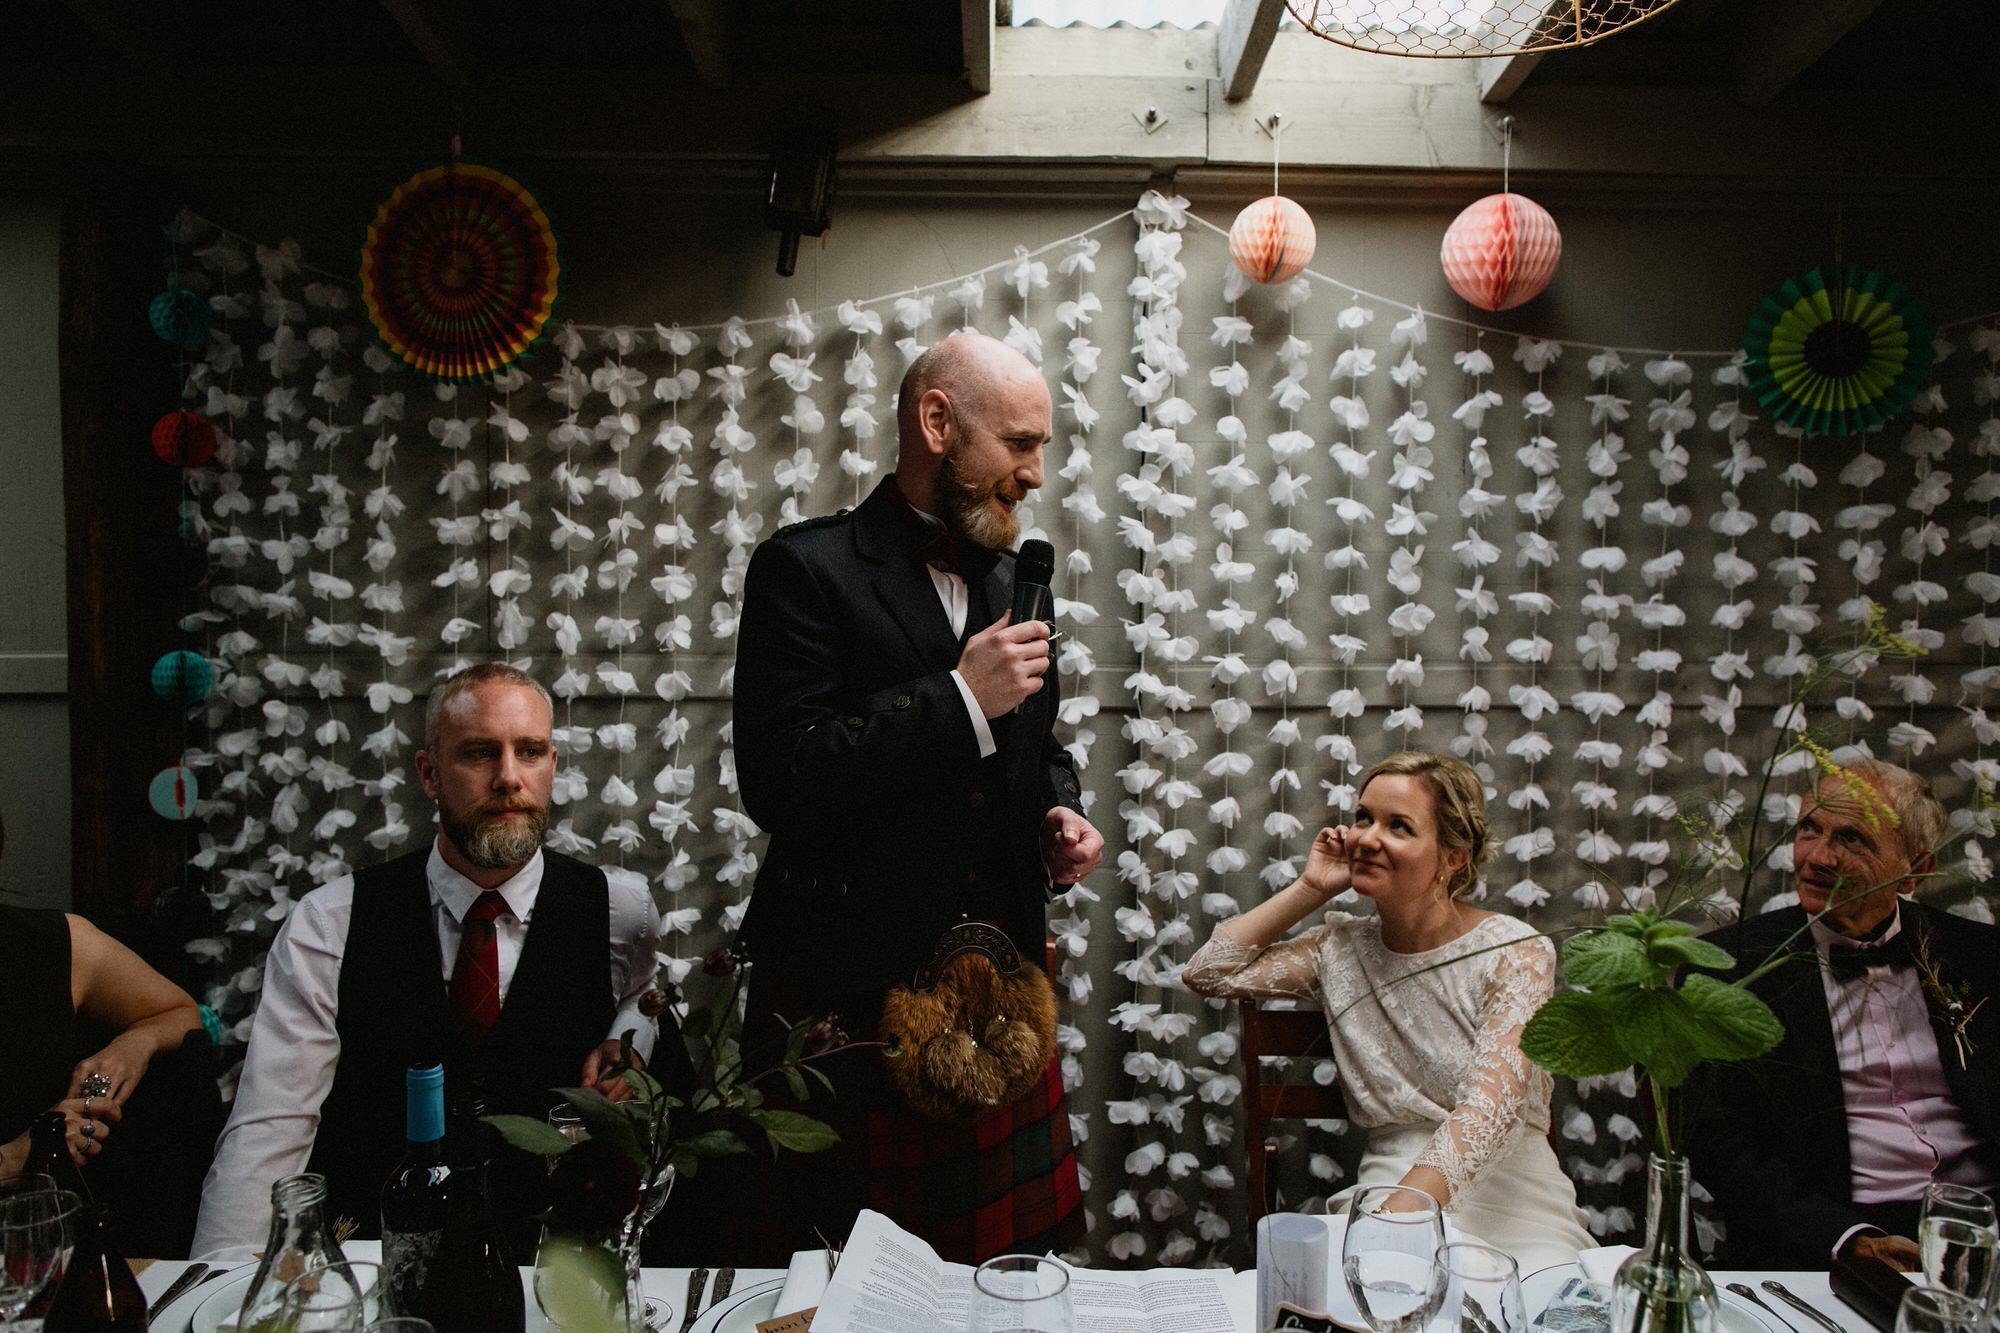 056 TIN SHED KNOCKRAICH WEDDING AUTUMN ZOE ALEXANDRA PHOTOGRAPHY